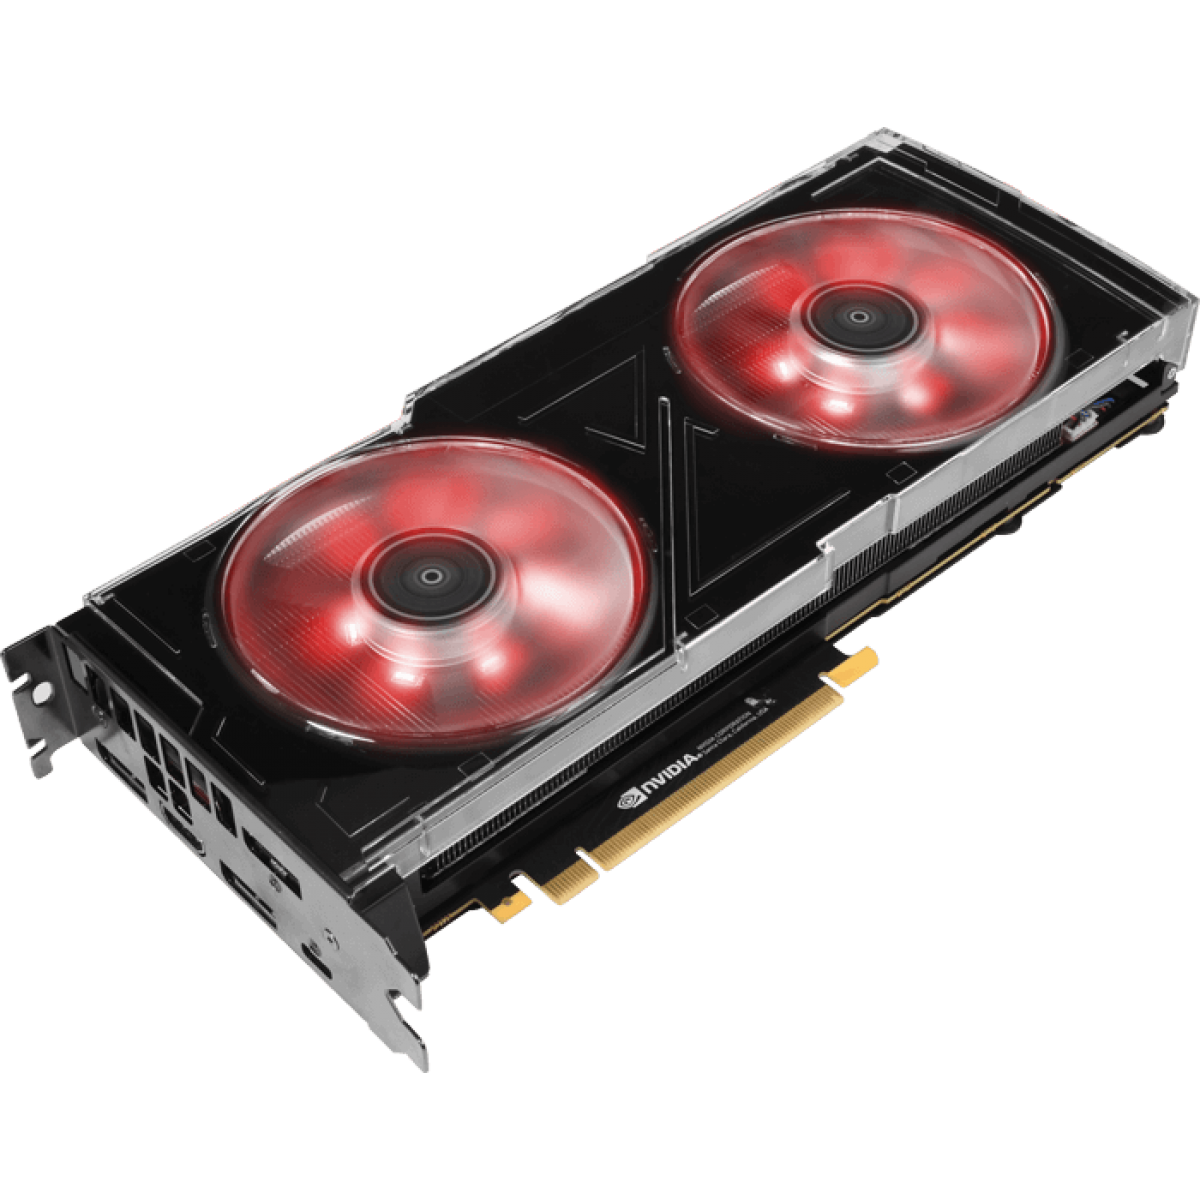 Placa de Vídeo Galax Geforce RTX 2080 Ti OC Dual, 11GB GDDR6, 352Bit, 28IULBUCT4OC